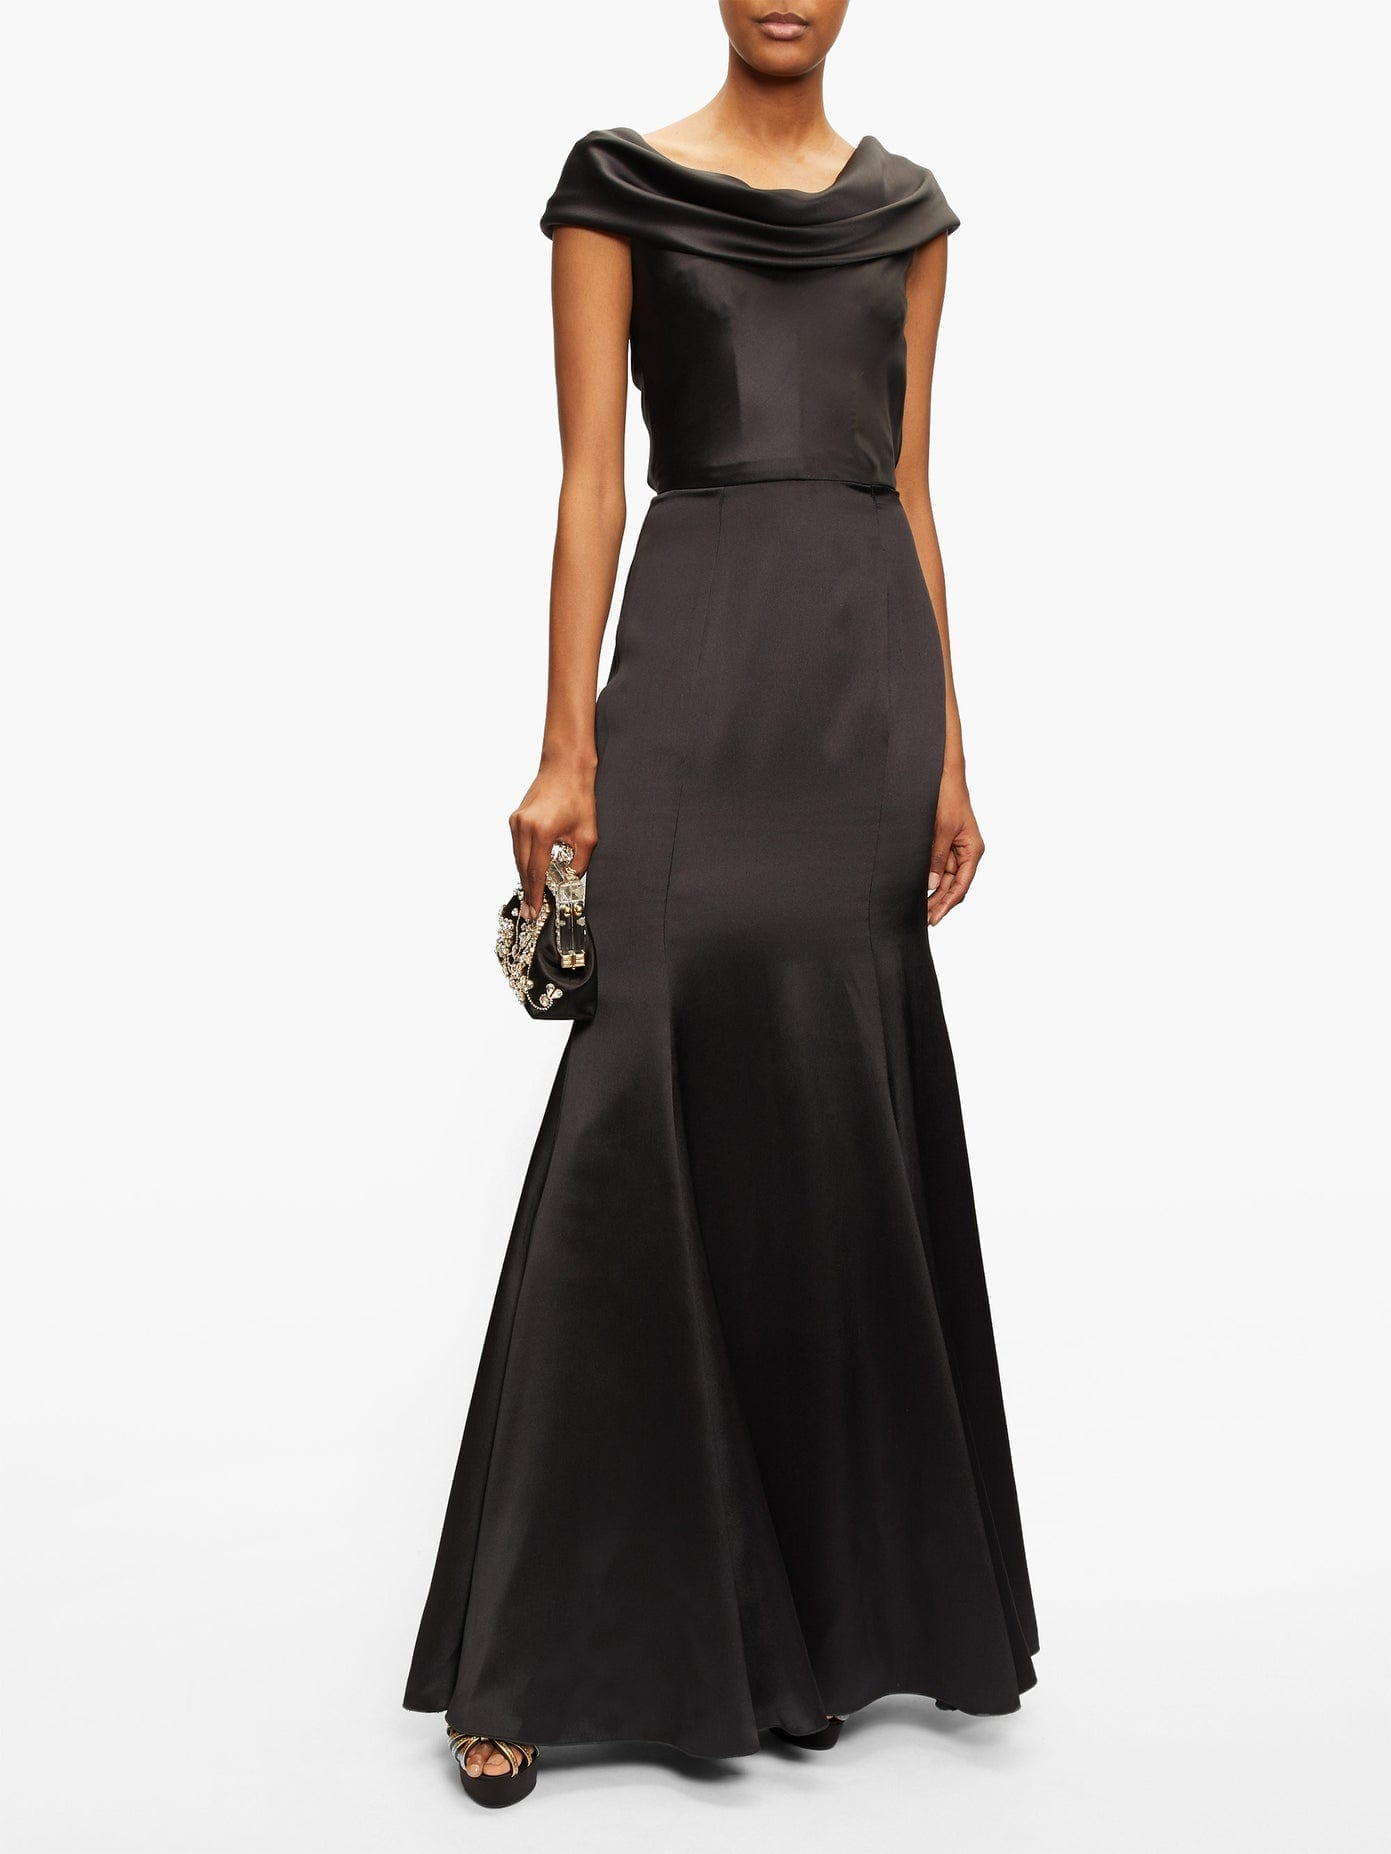 DOLCE & GABBANA Cowl-neck Silk-blend Satin Gown